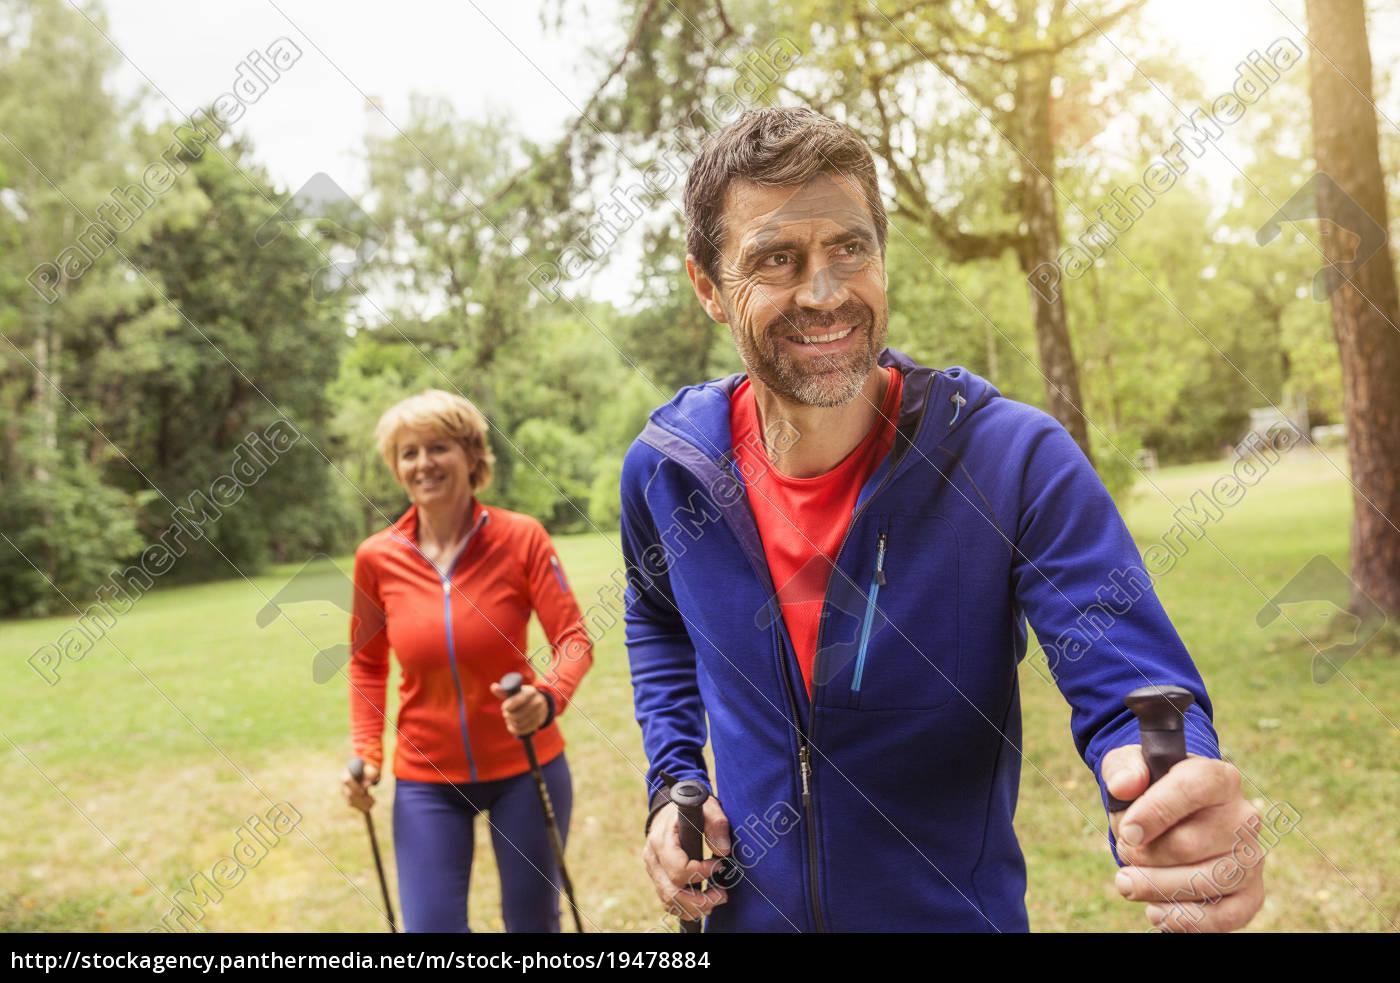 couple, walking, outdoors, , using, walking, poles - 19478884